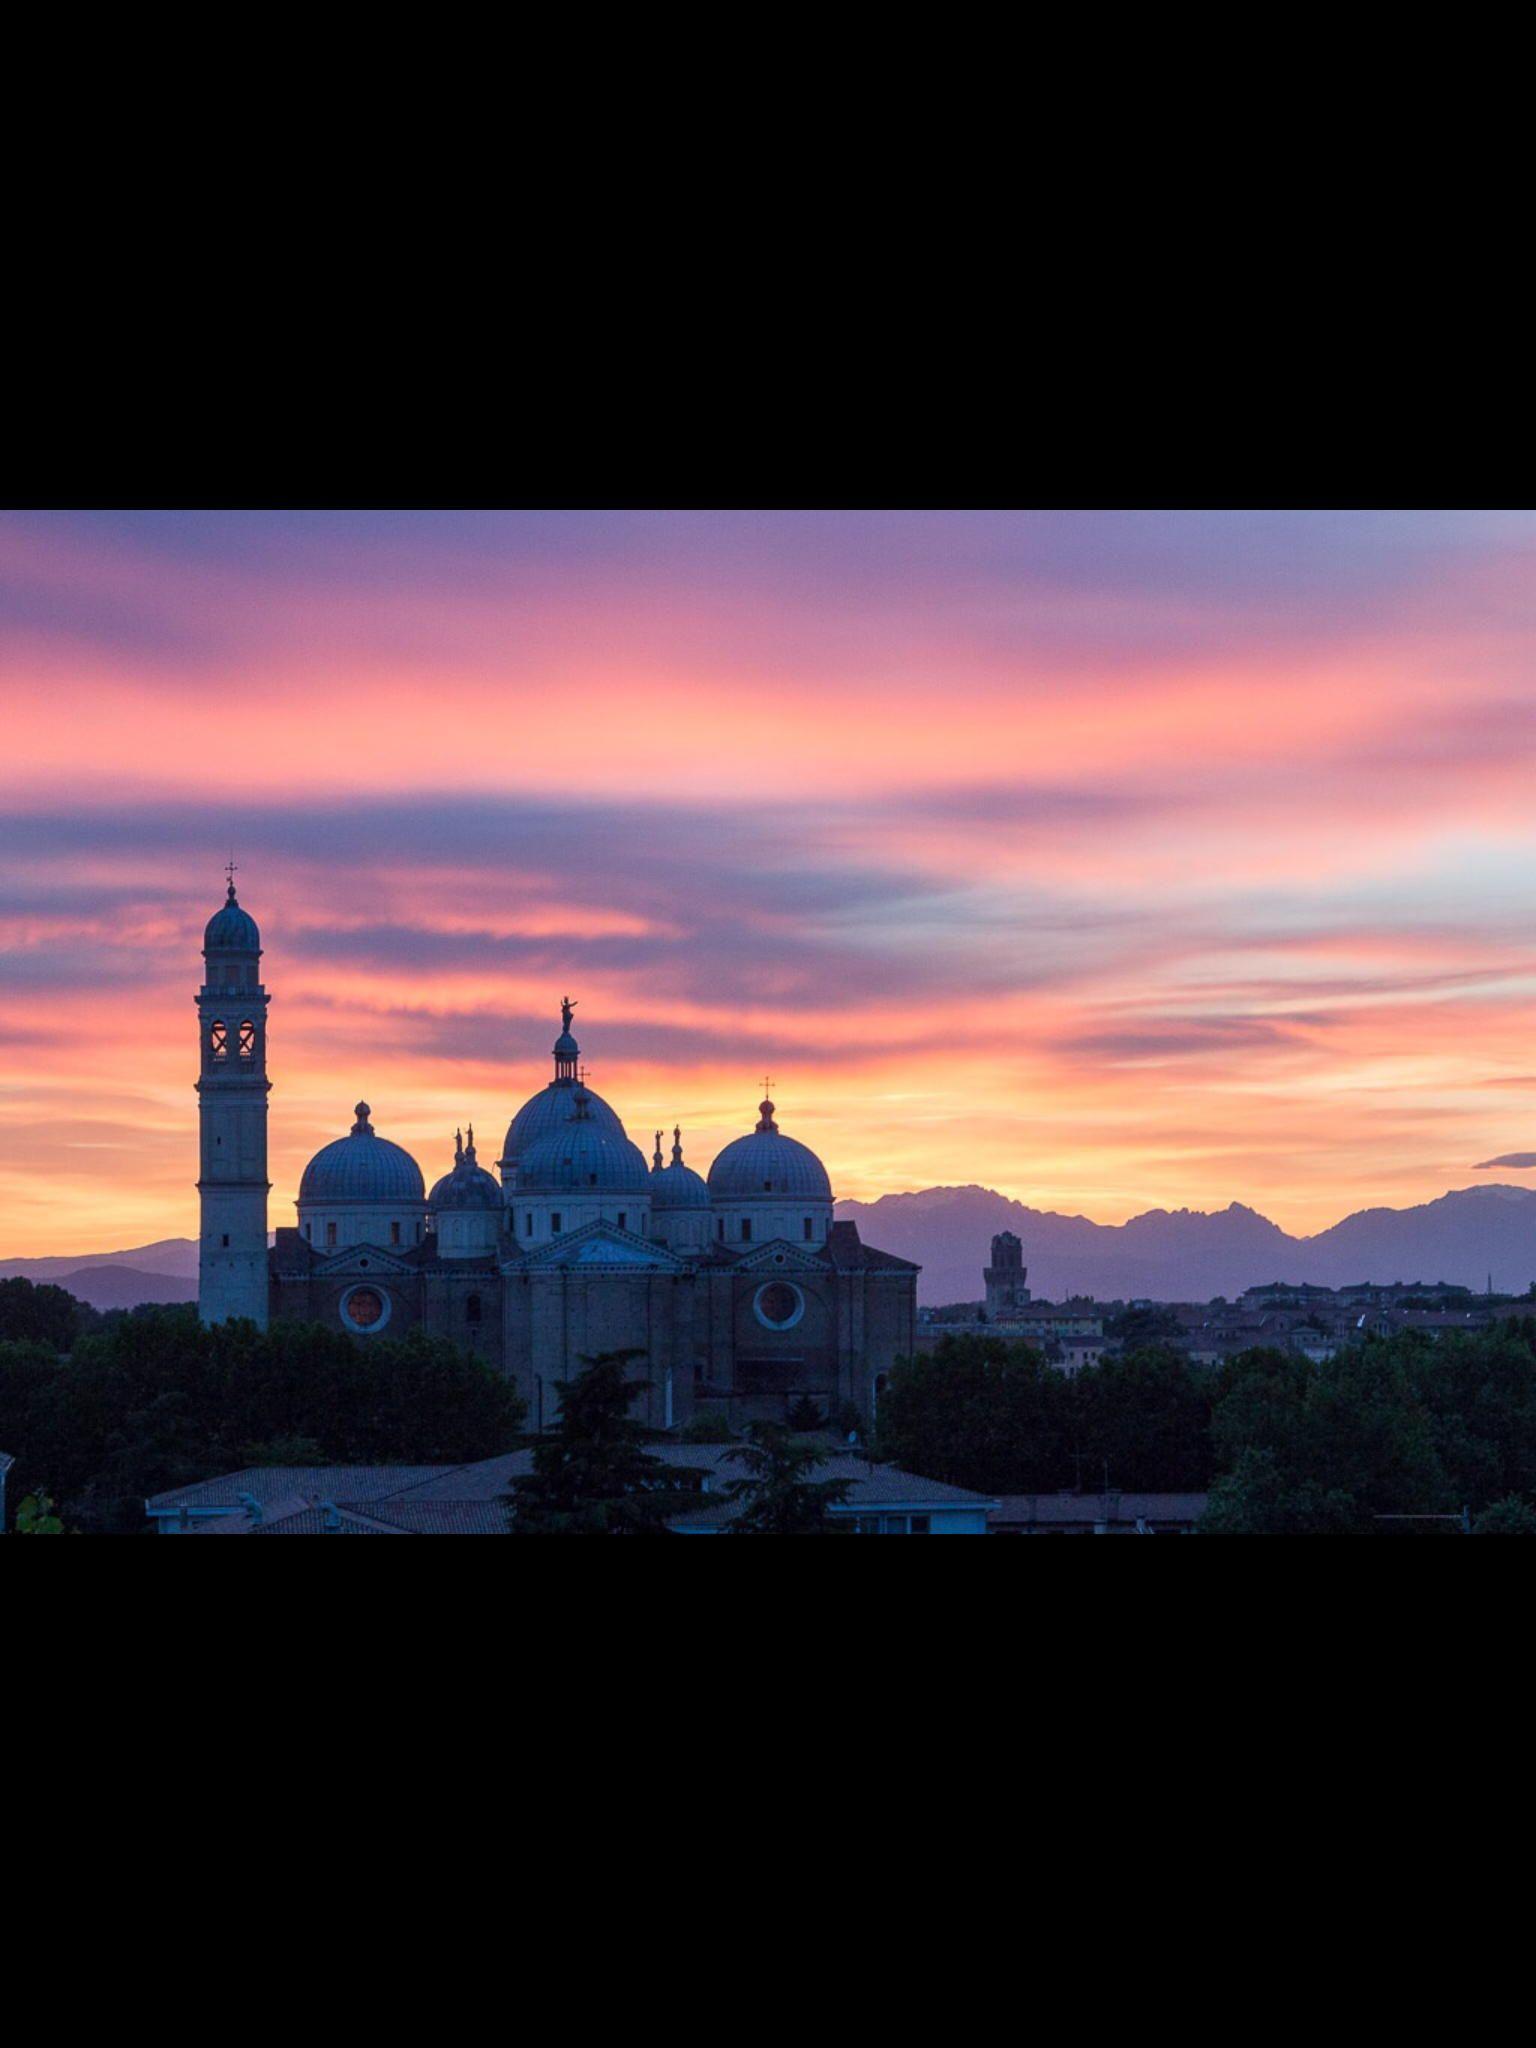 Basilica Santa Giustina Italy Padua by Stefano Peroni on 500px